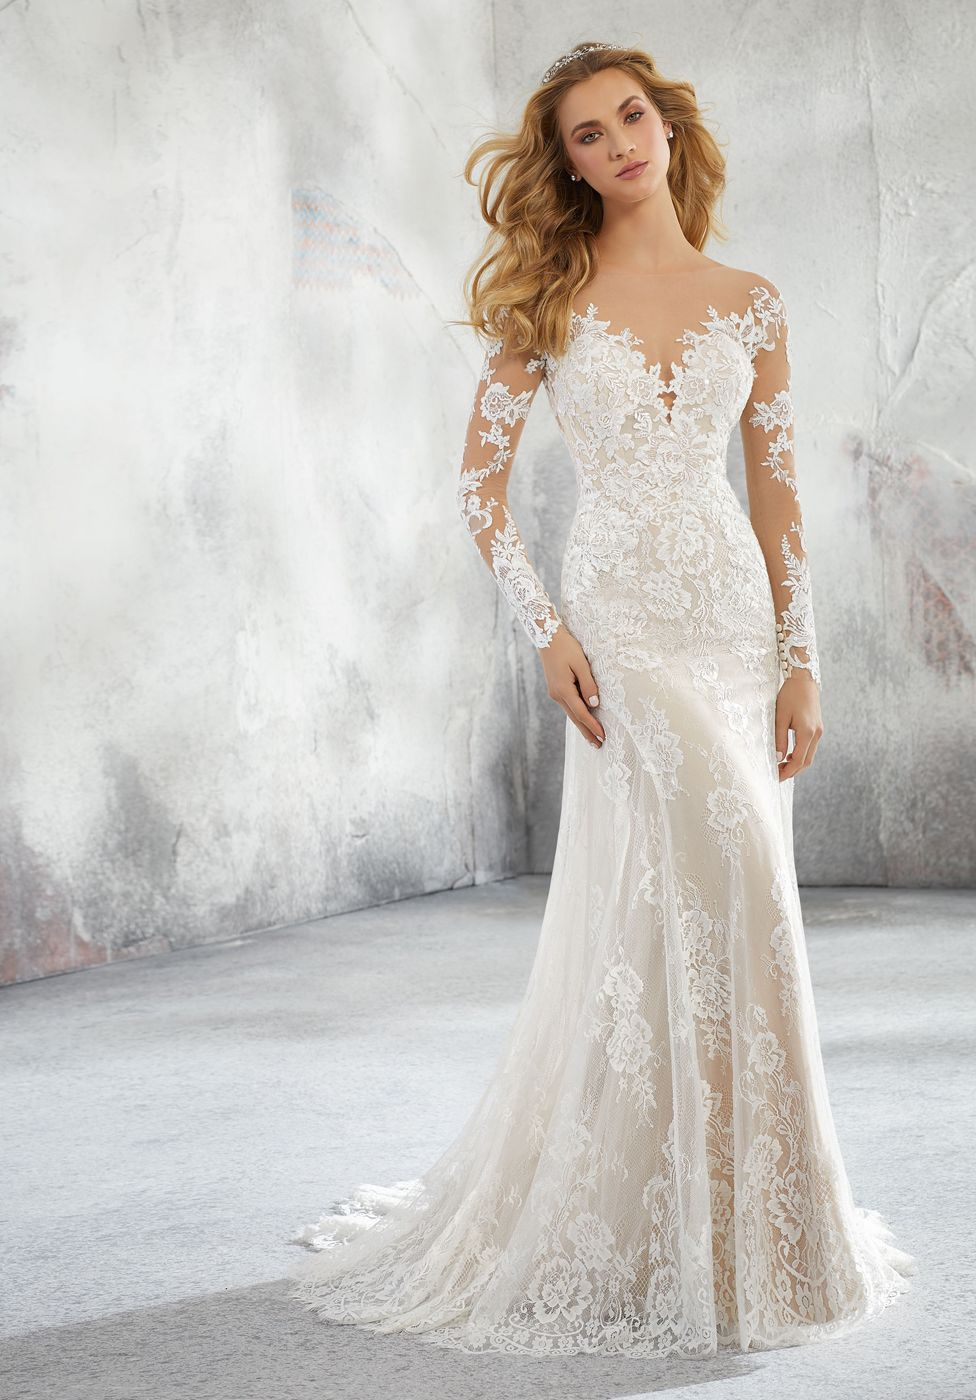 Mori Lee 8276 Lorraine Long Sleeves Bridal Dress Fit And Flare Wedding Dress A Line Wedding Dress Wedding Dress Styles [ 1400 x 976 Pixel ]